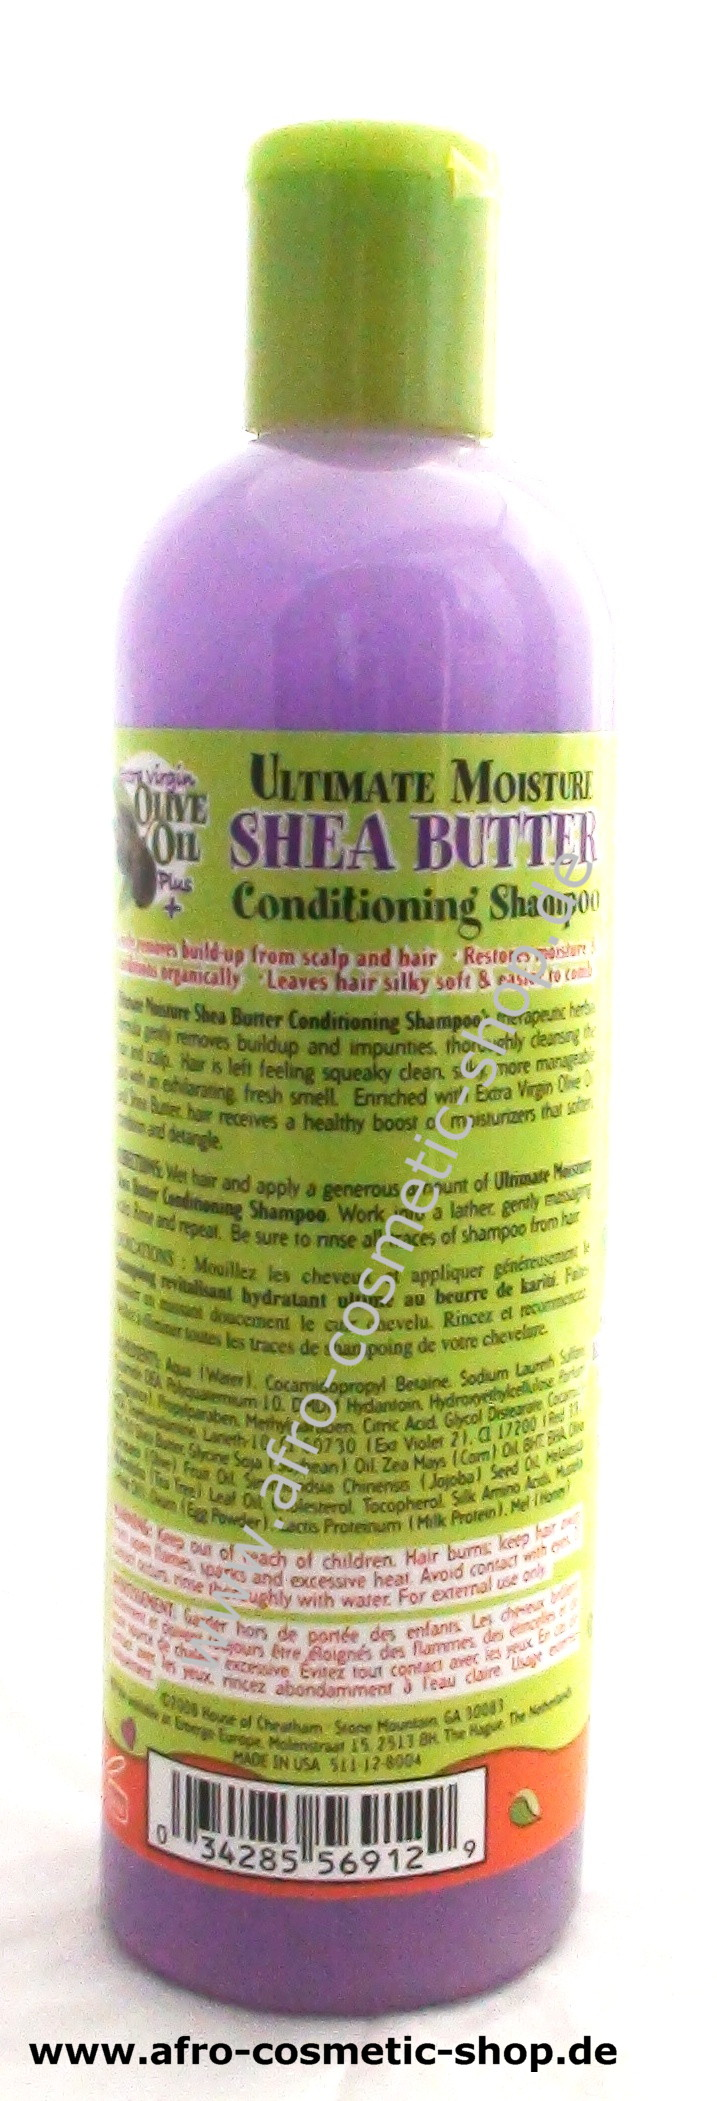 Image Result For Shea Moisture Hair Care Productsa